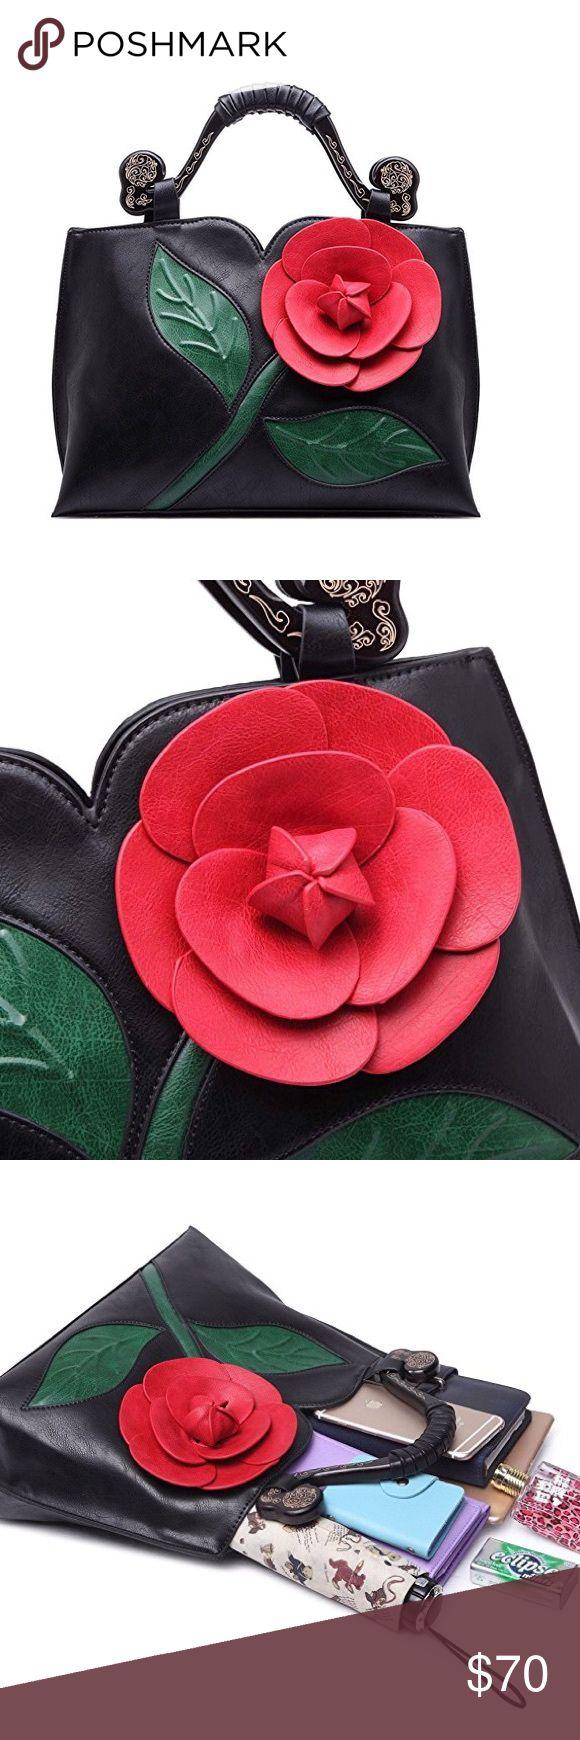 "🆕 Unique Black Flower Purse Brand new. Comes with removable shoulder strap. Measures 14.1"" wide x10.2"" high x5.5"" deep. Bags Shoulder Bags"